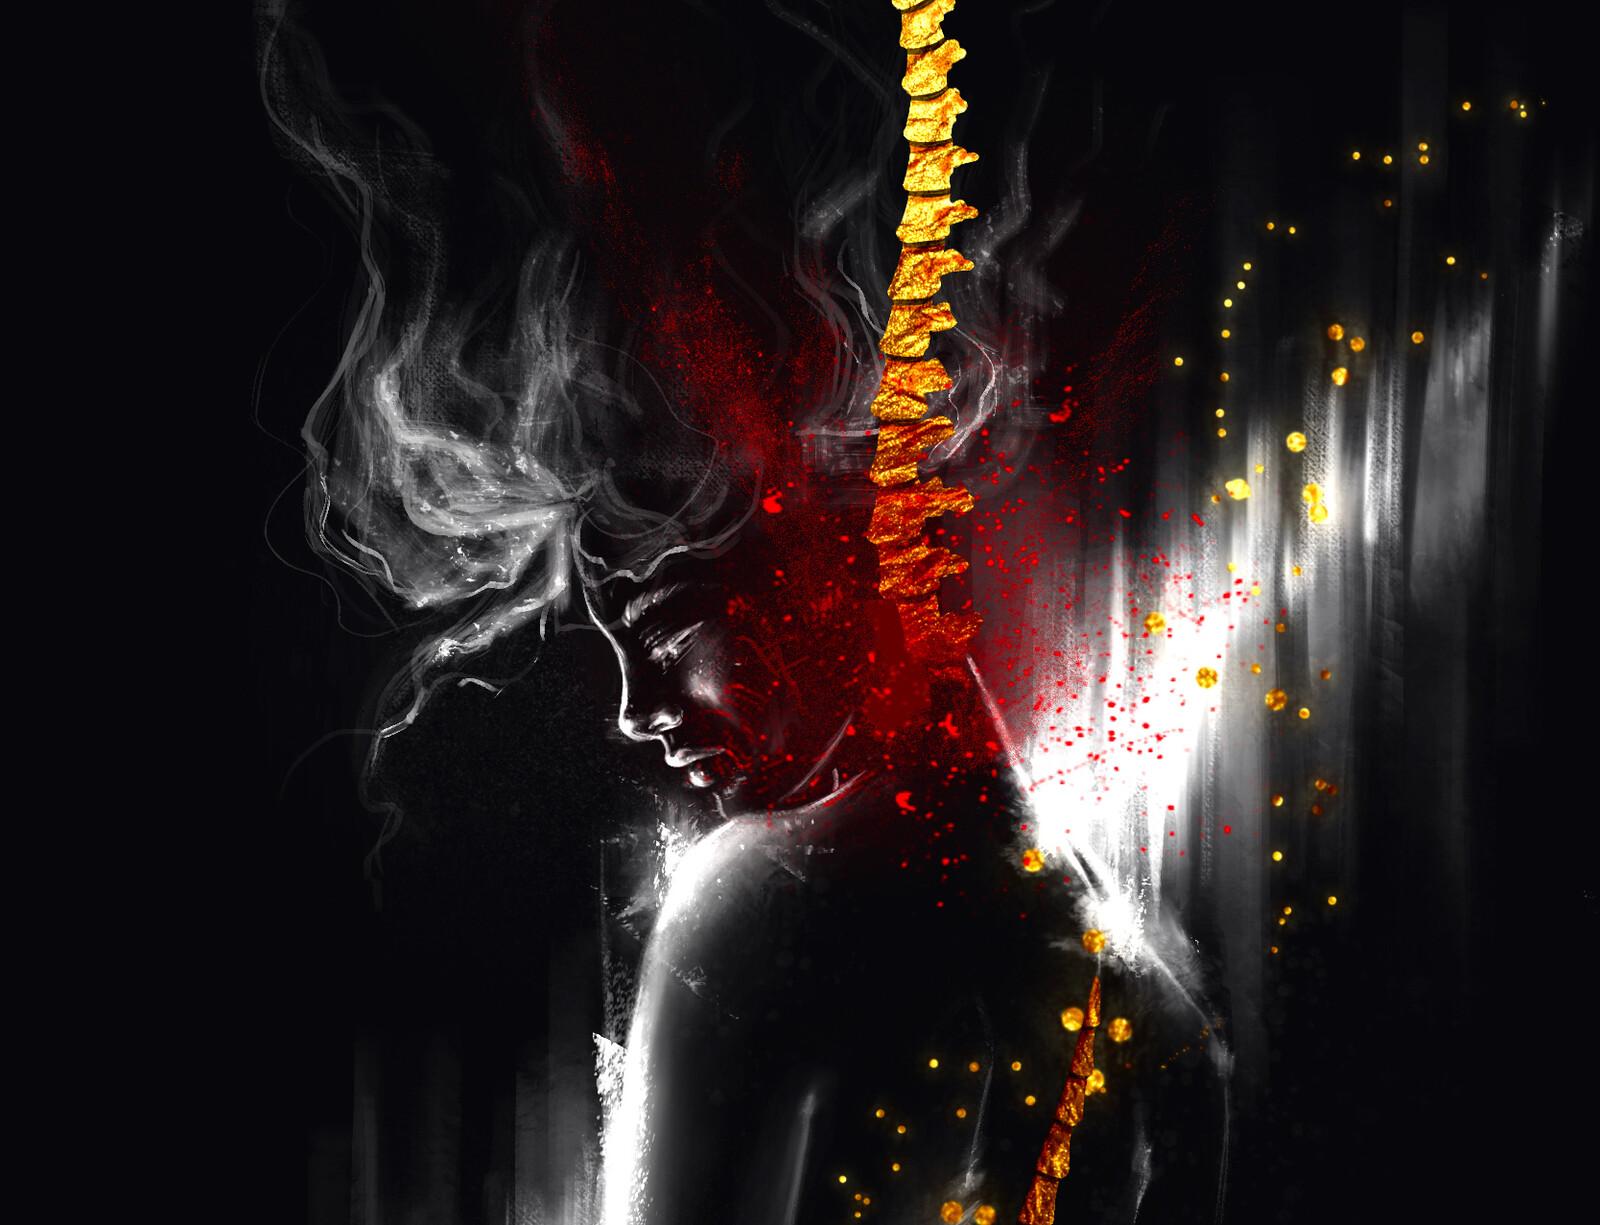 Illustration // Golden Spine